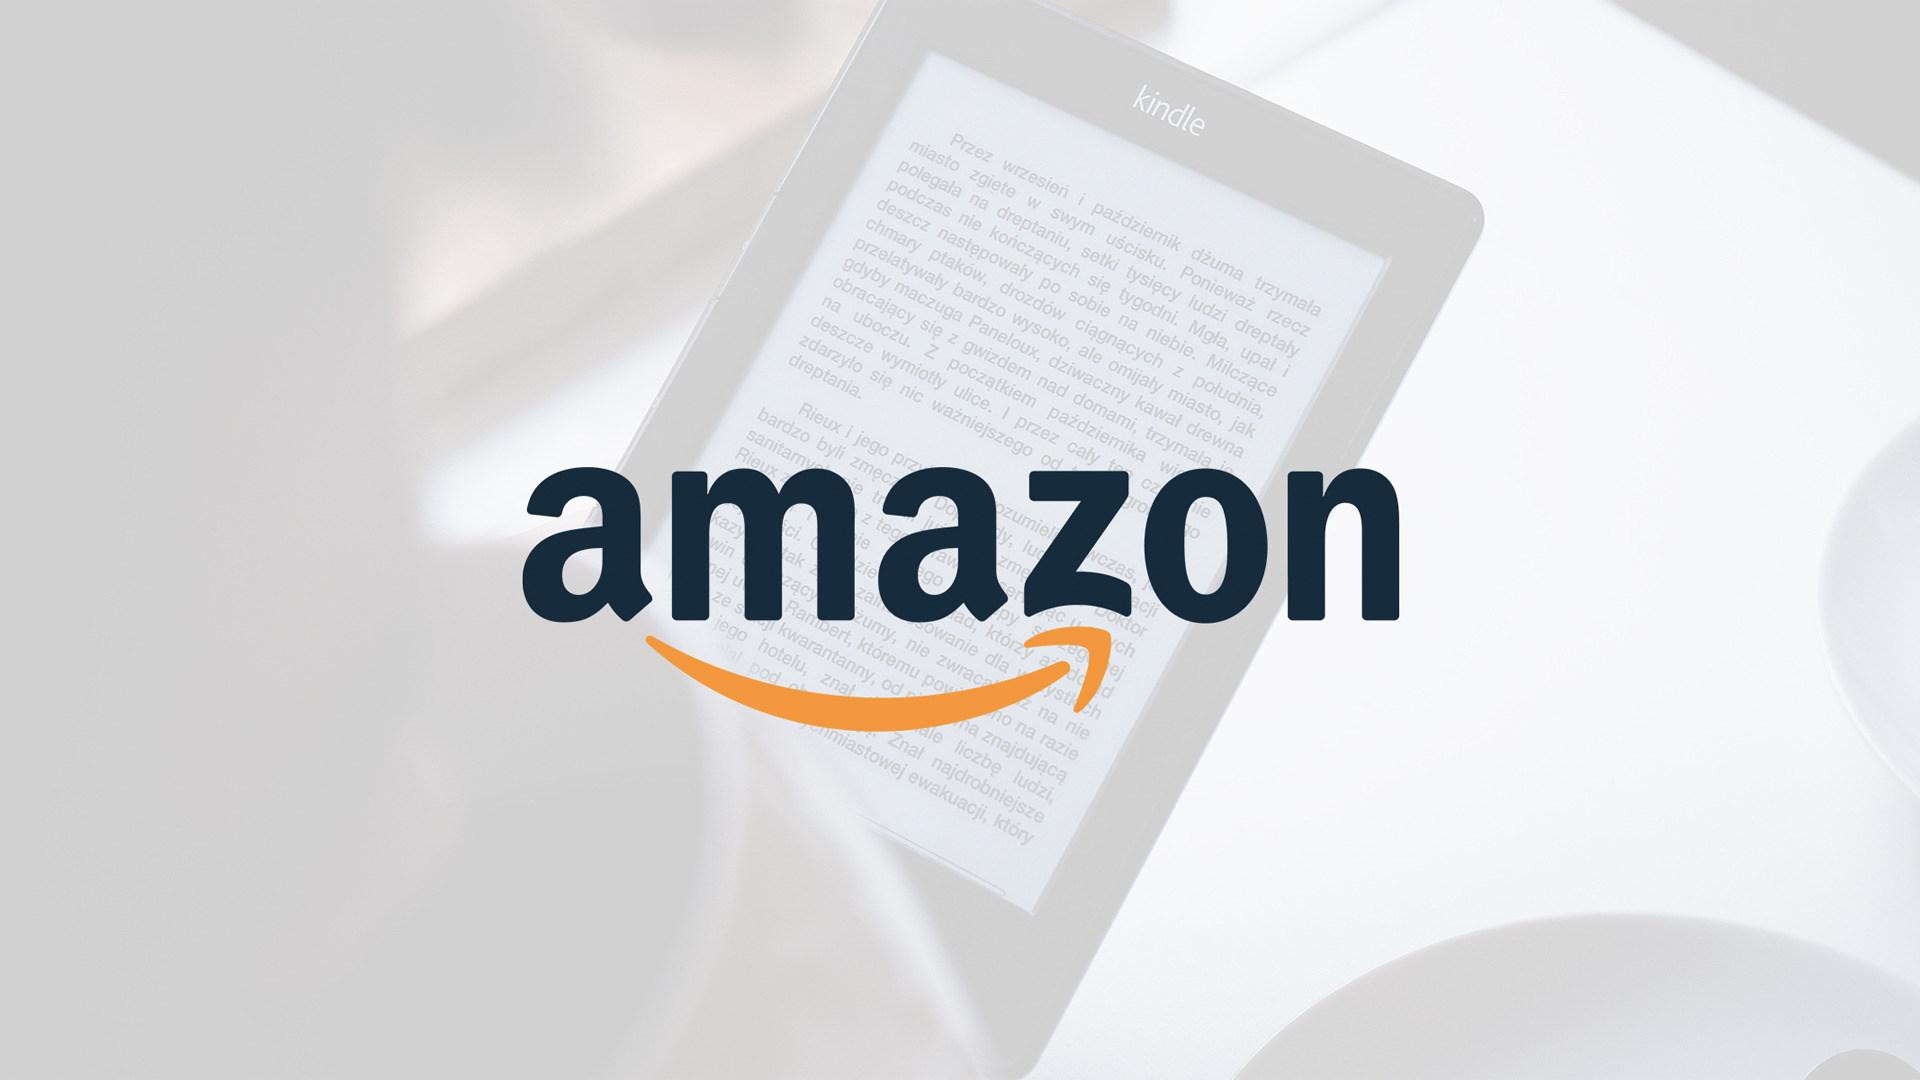 Amazon, Sprachassistent, Alexa, Kindle, E-Book, Amazon Kindle, Reader, Amazon Logo, Amazon Kindle Fire